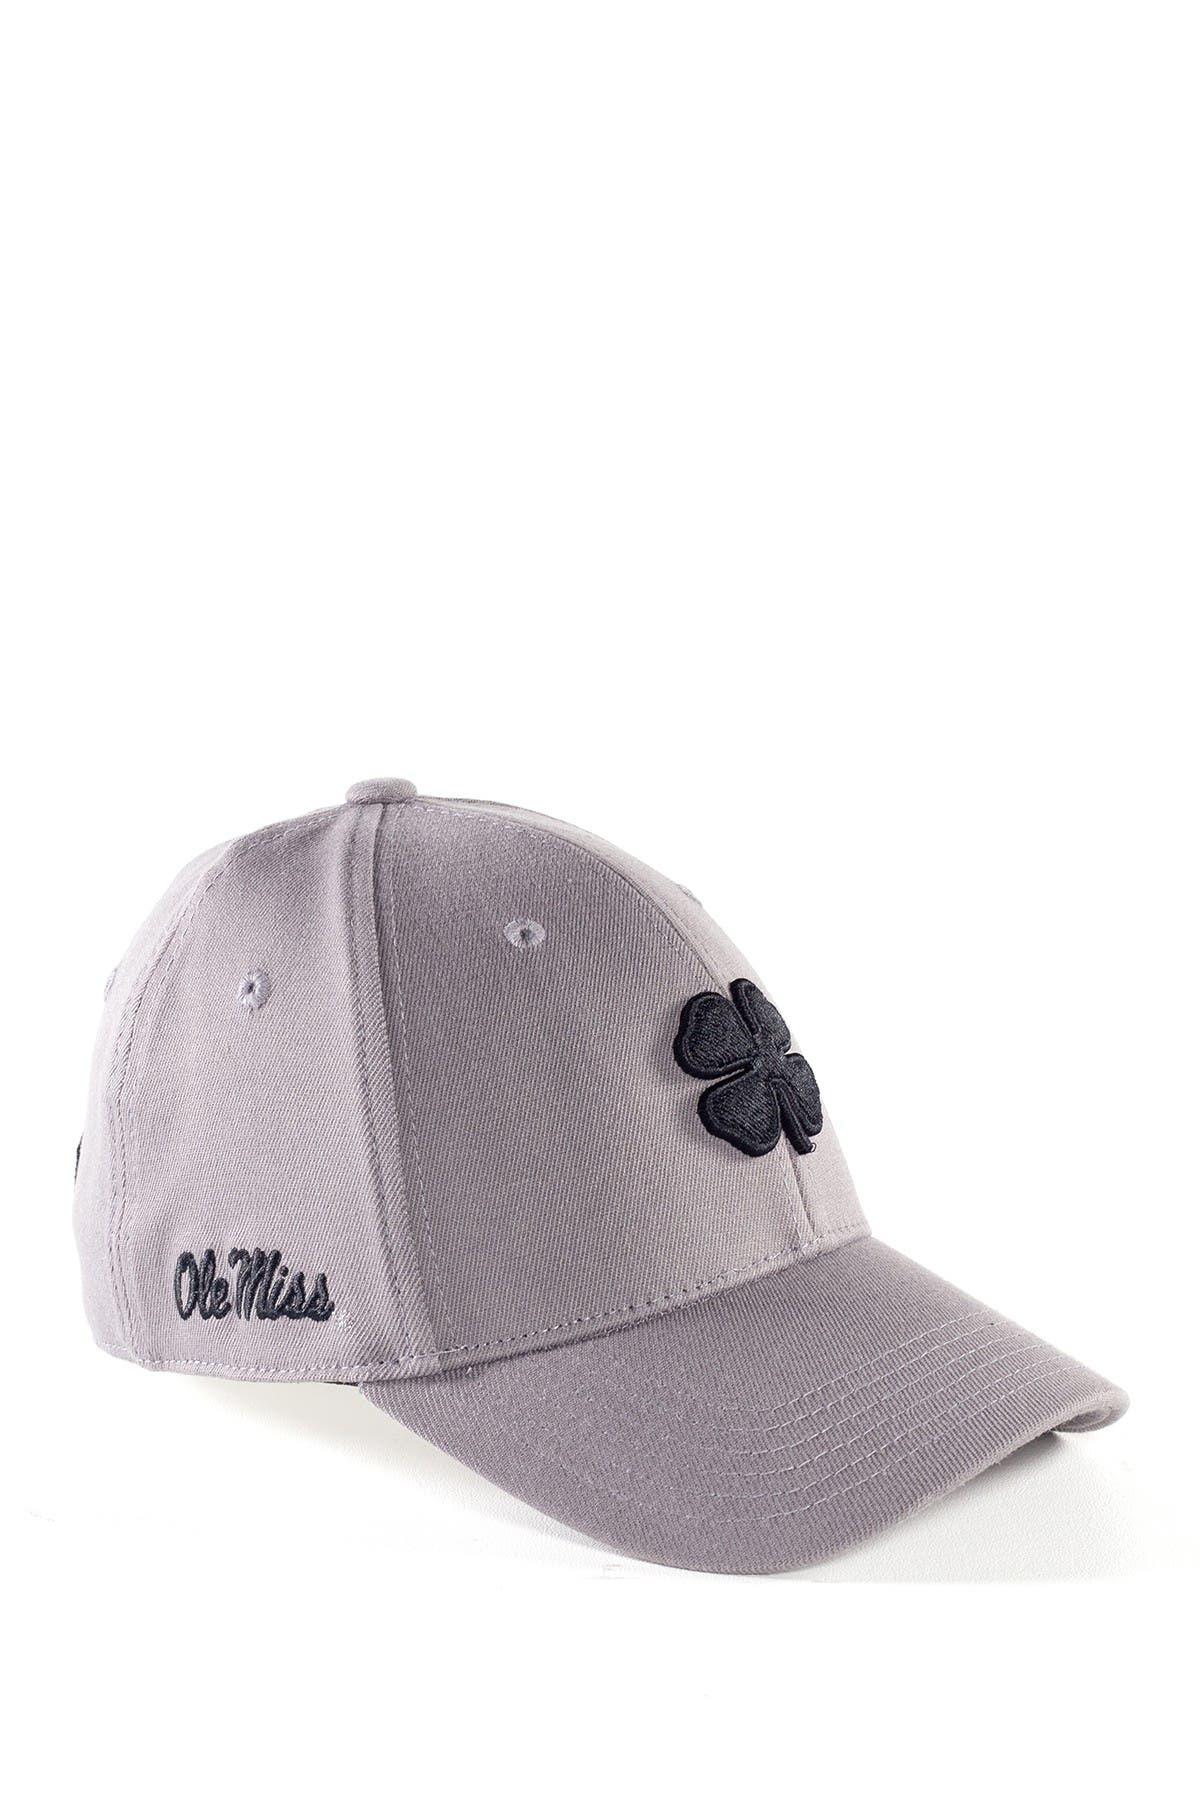 Image of Black Clover Ole Mississippi Baseball Cap